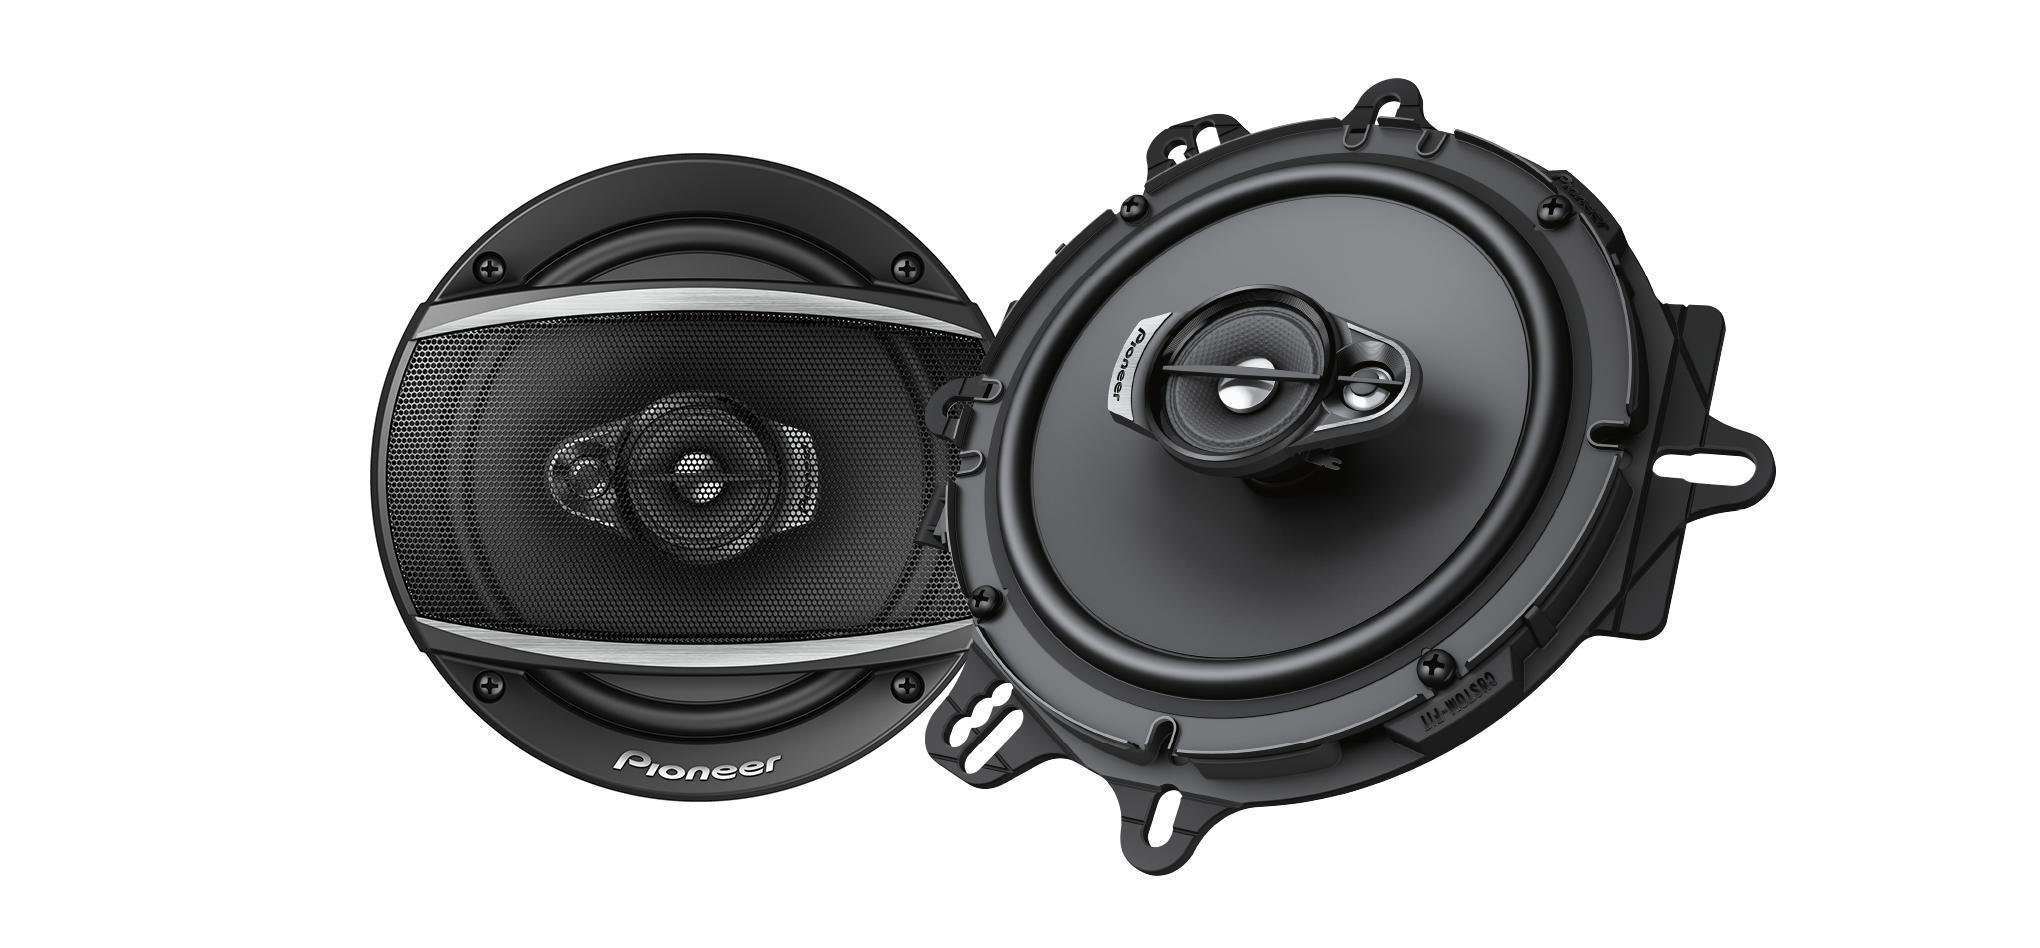 Speakers TS-A1670F PIONEER TS-A1670F van originele kwaliteit